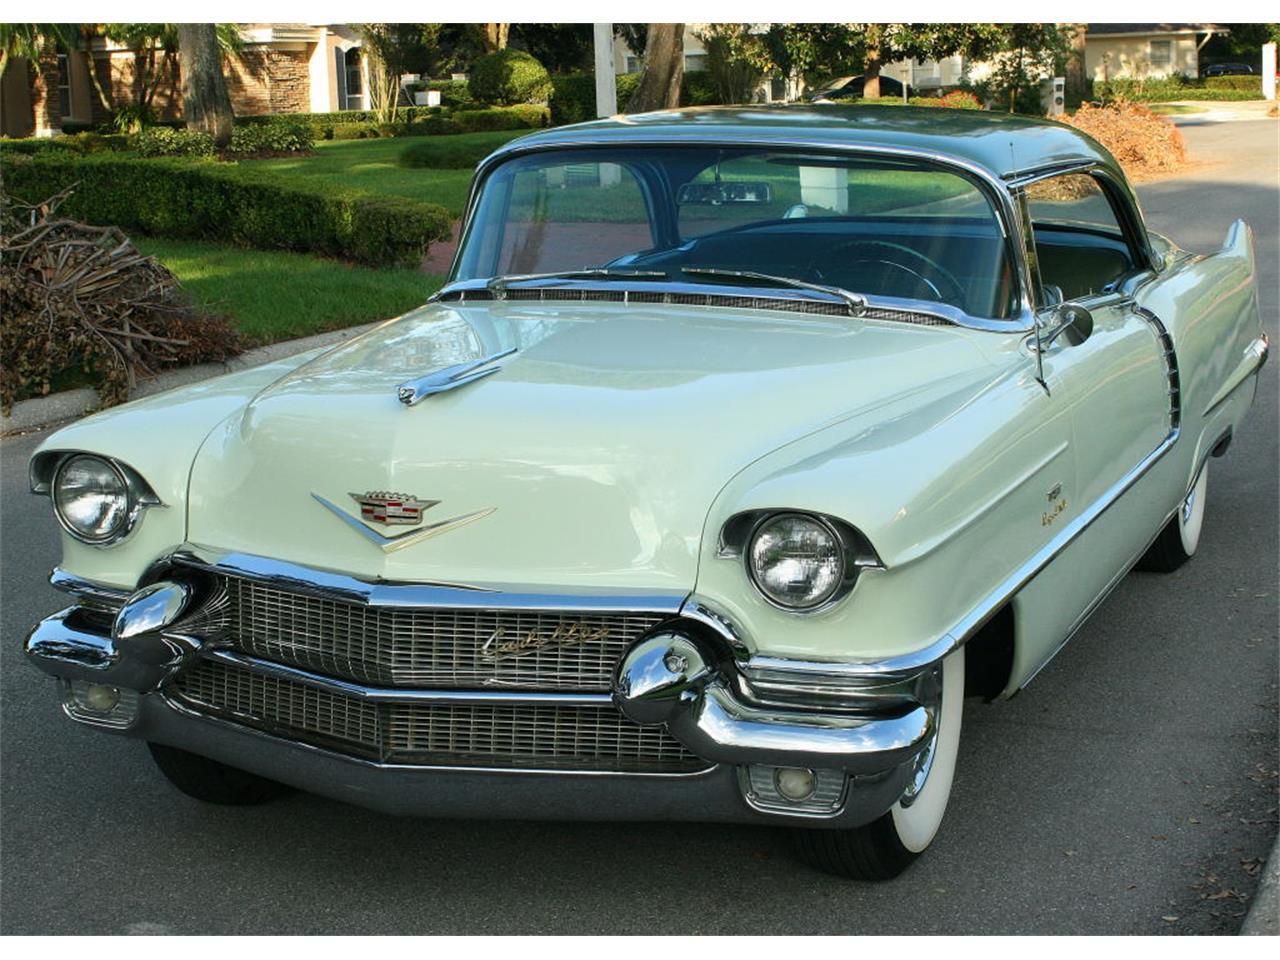 1956 Cadillac Coupe DeVille for Sale | ClassicCars.com ...